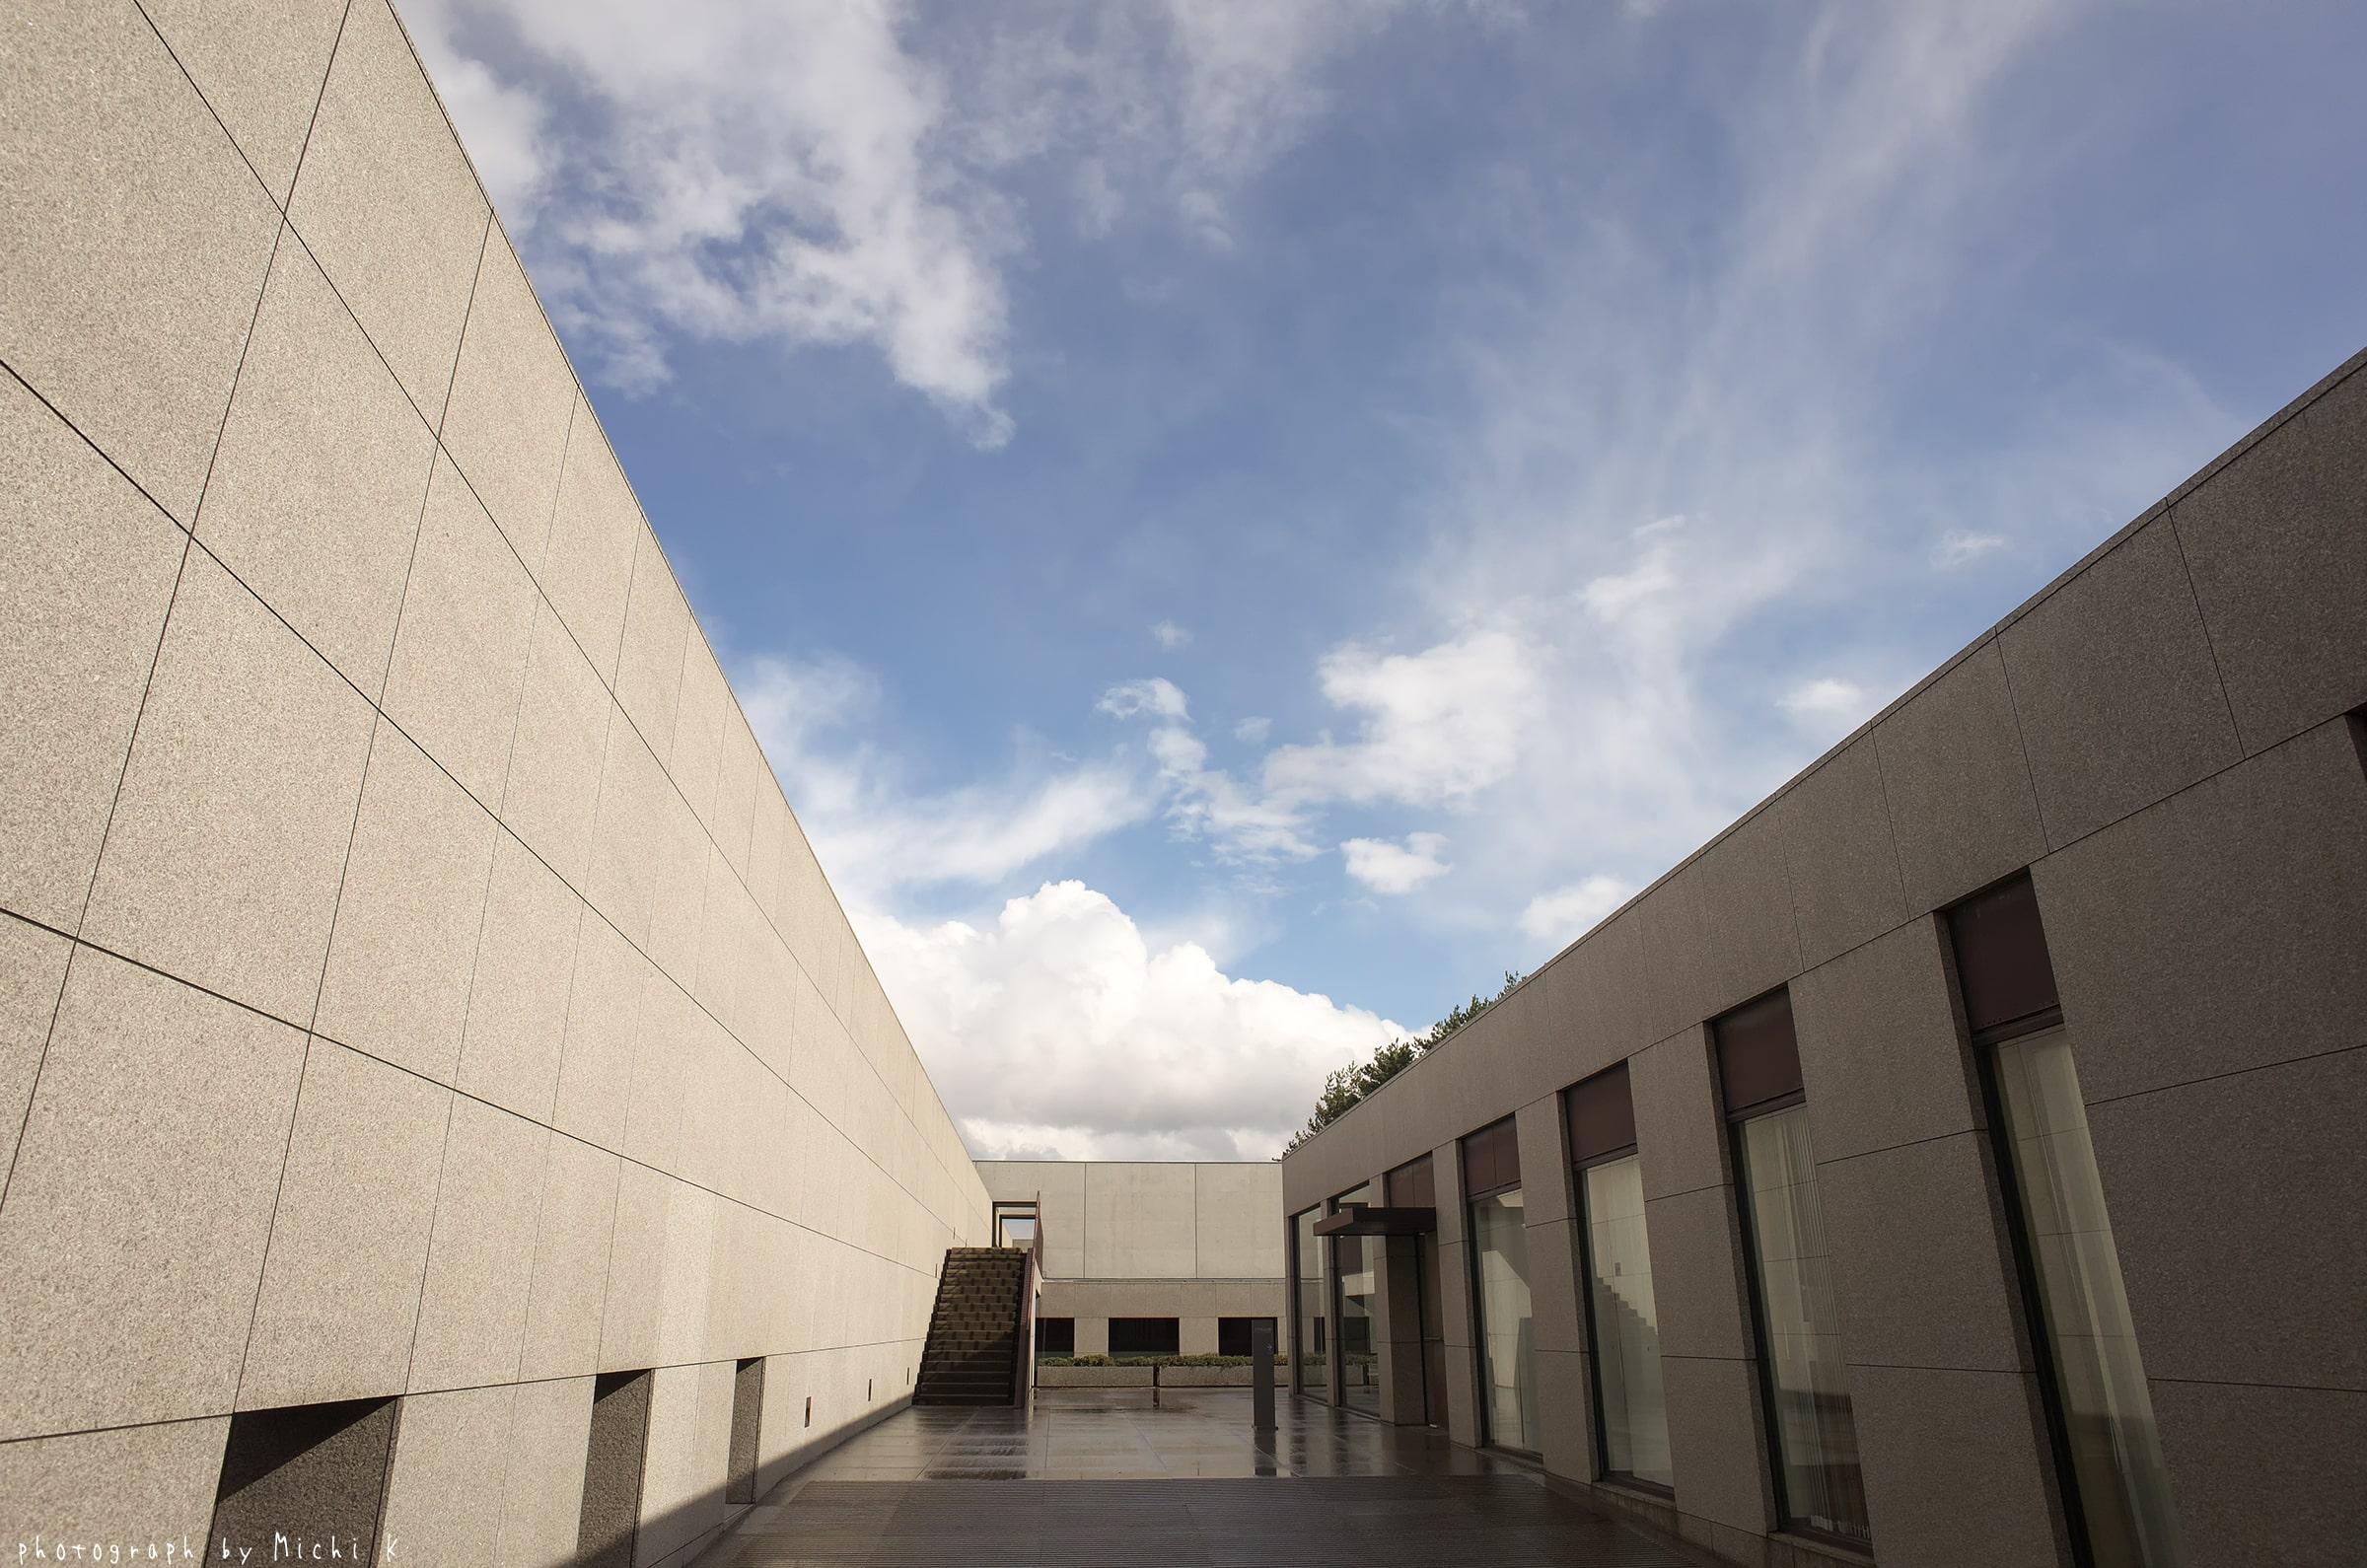 土門拳記念館2018-11-23昼(写真その5)